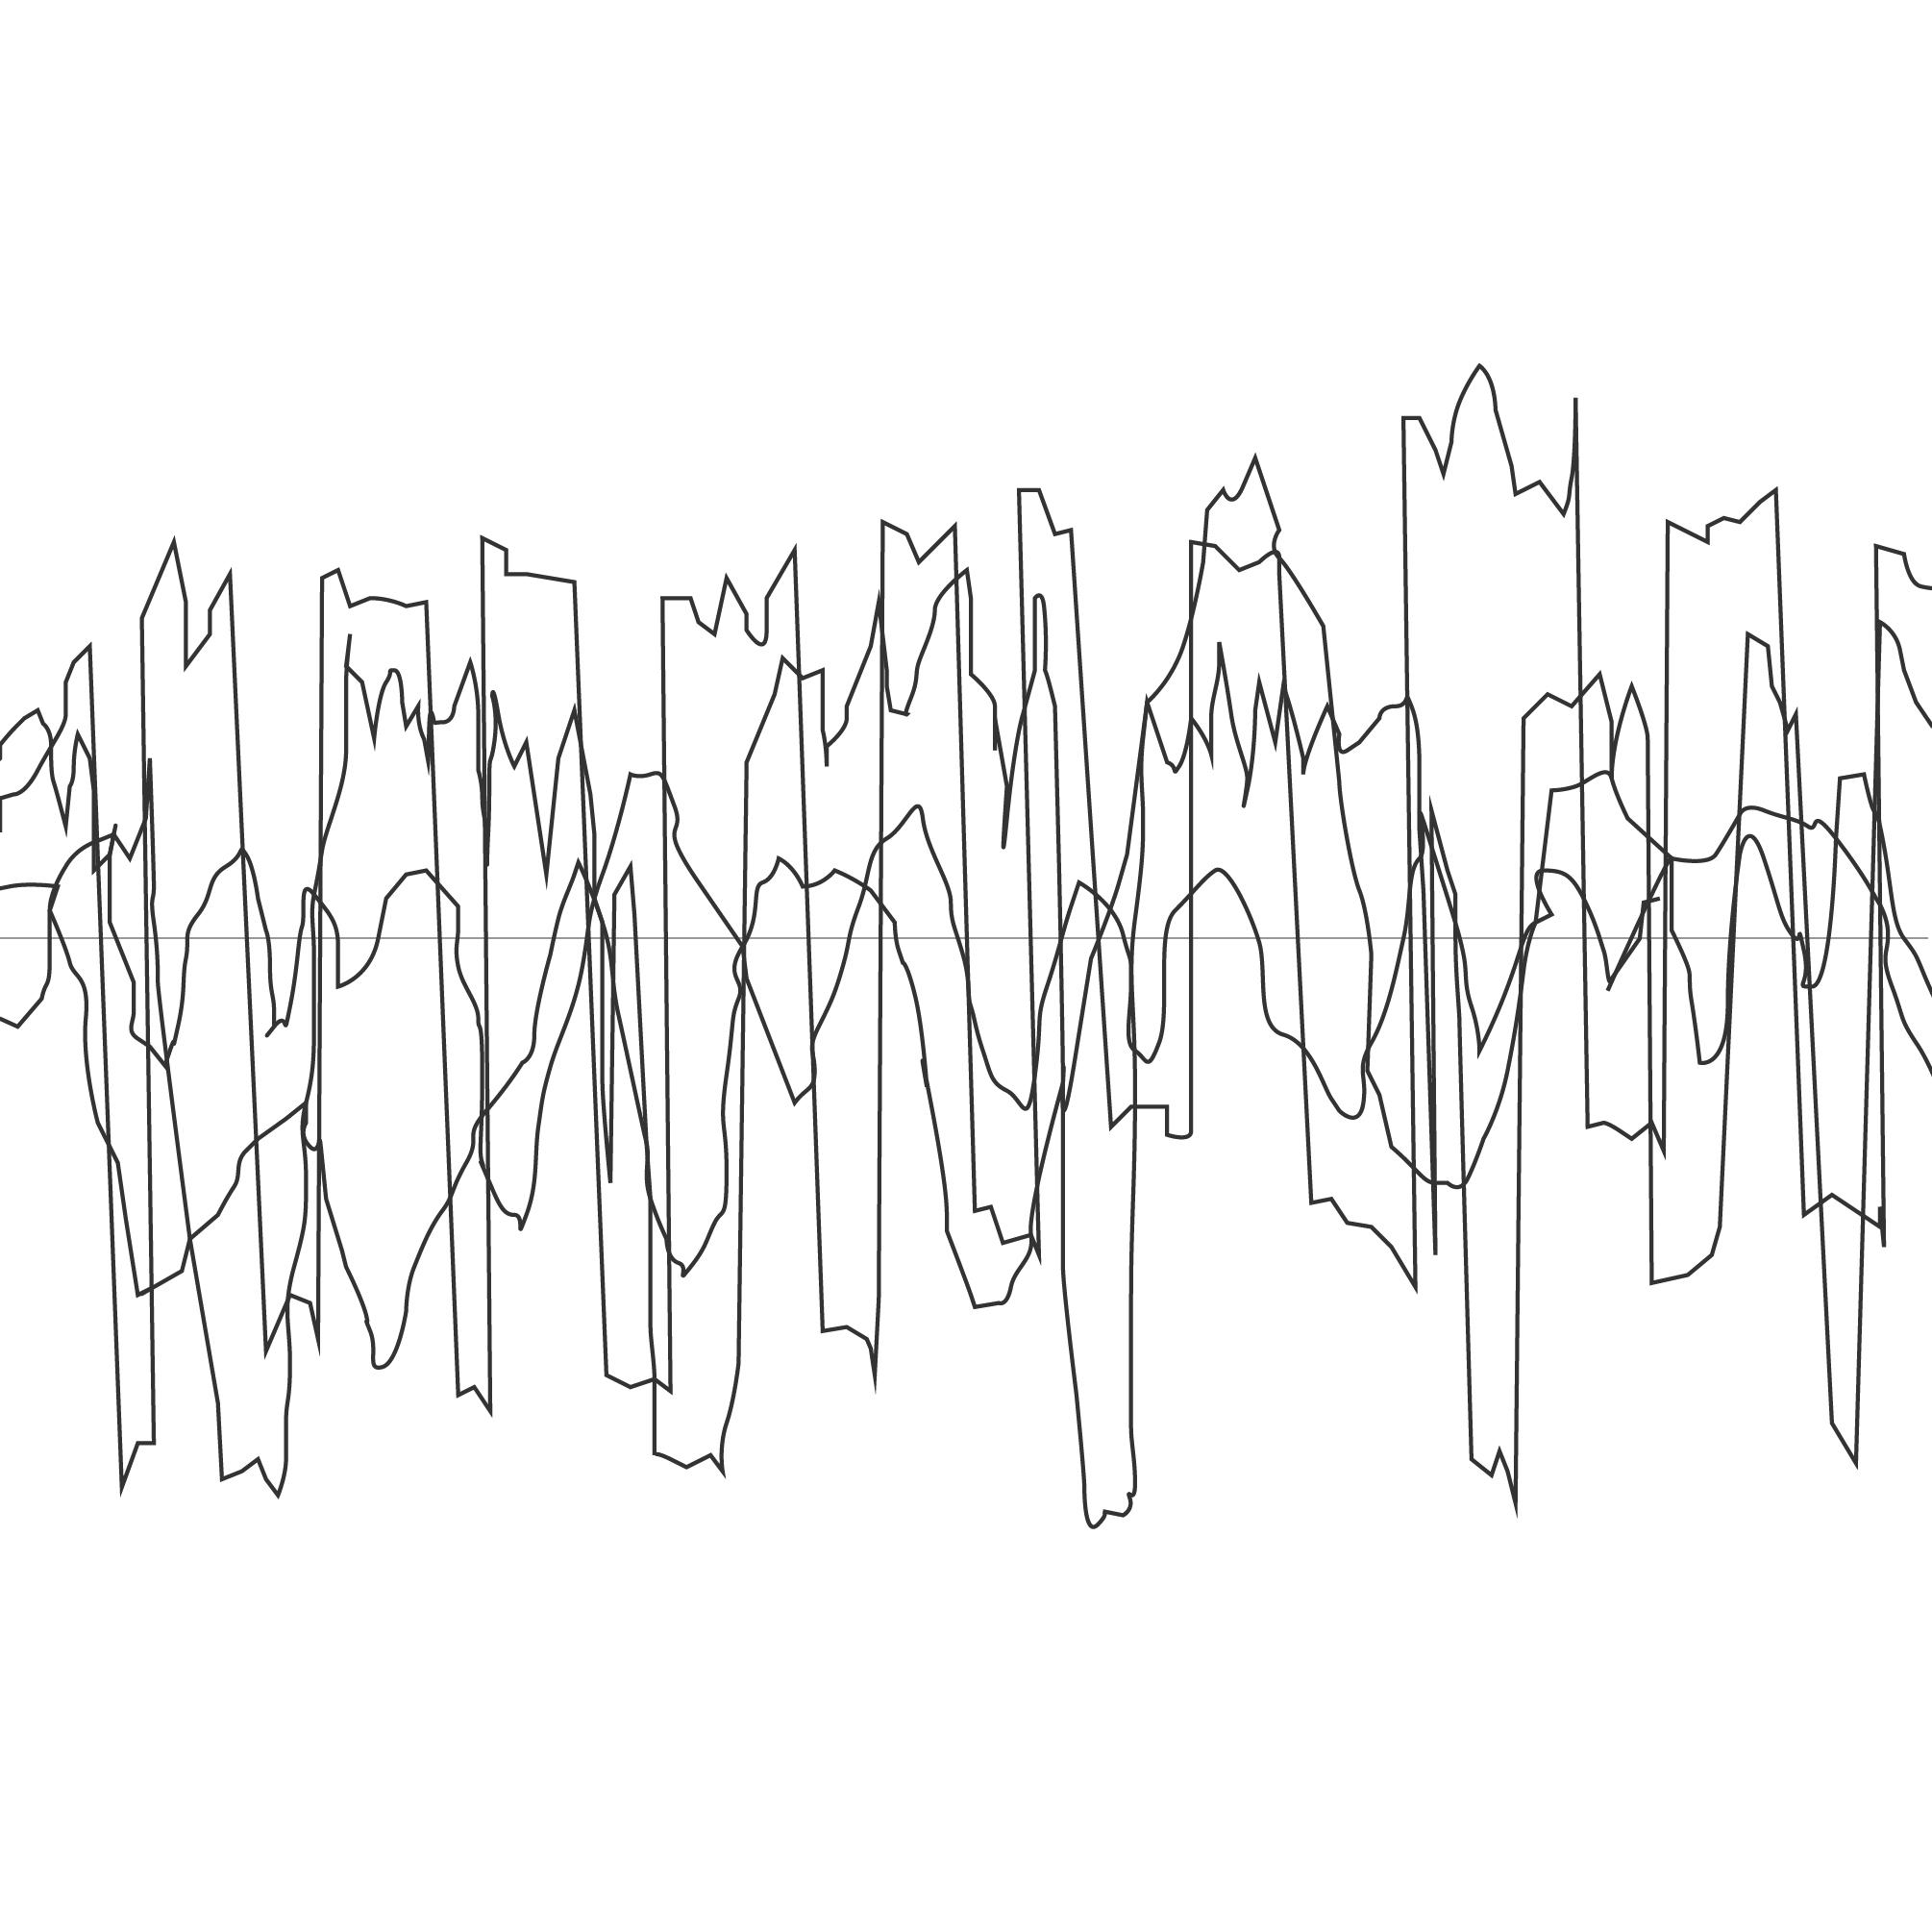 2010x2010 Soundwaves Pro 3 Sound Waves And Illustrations